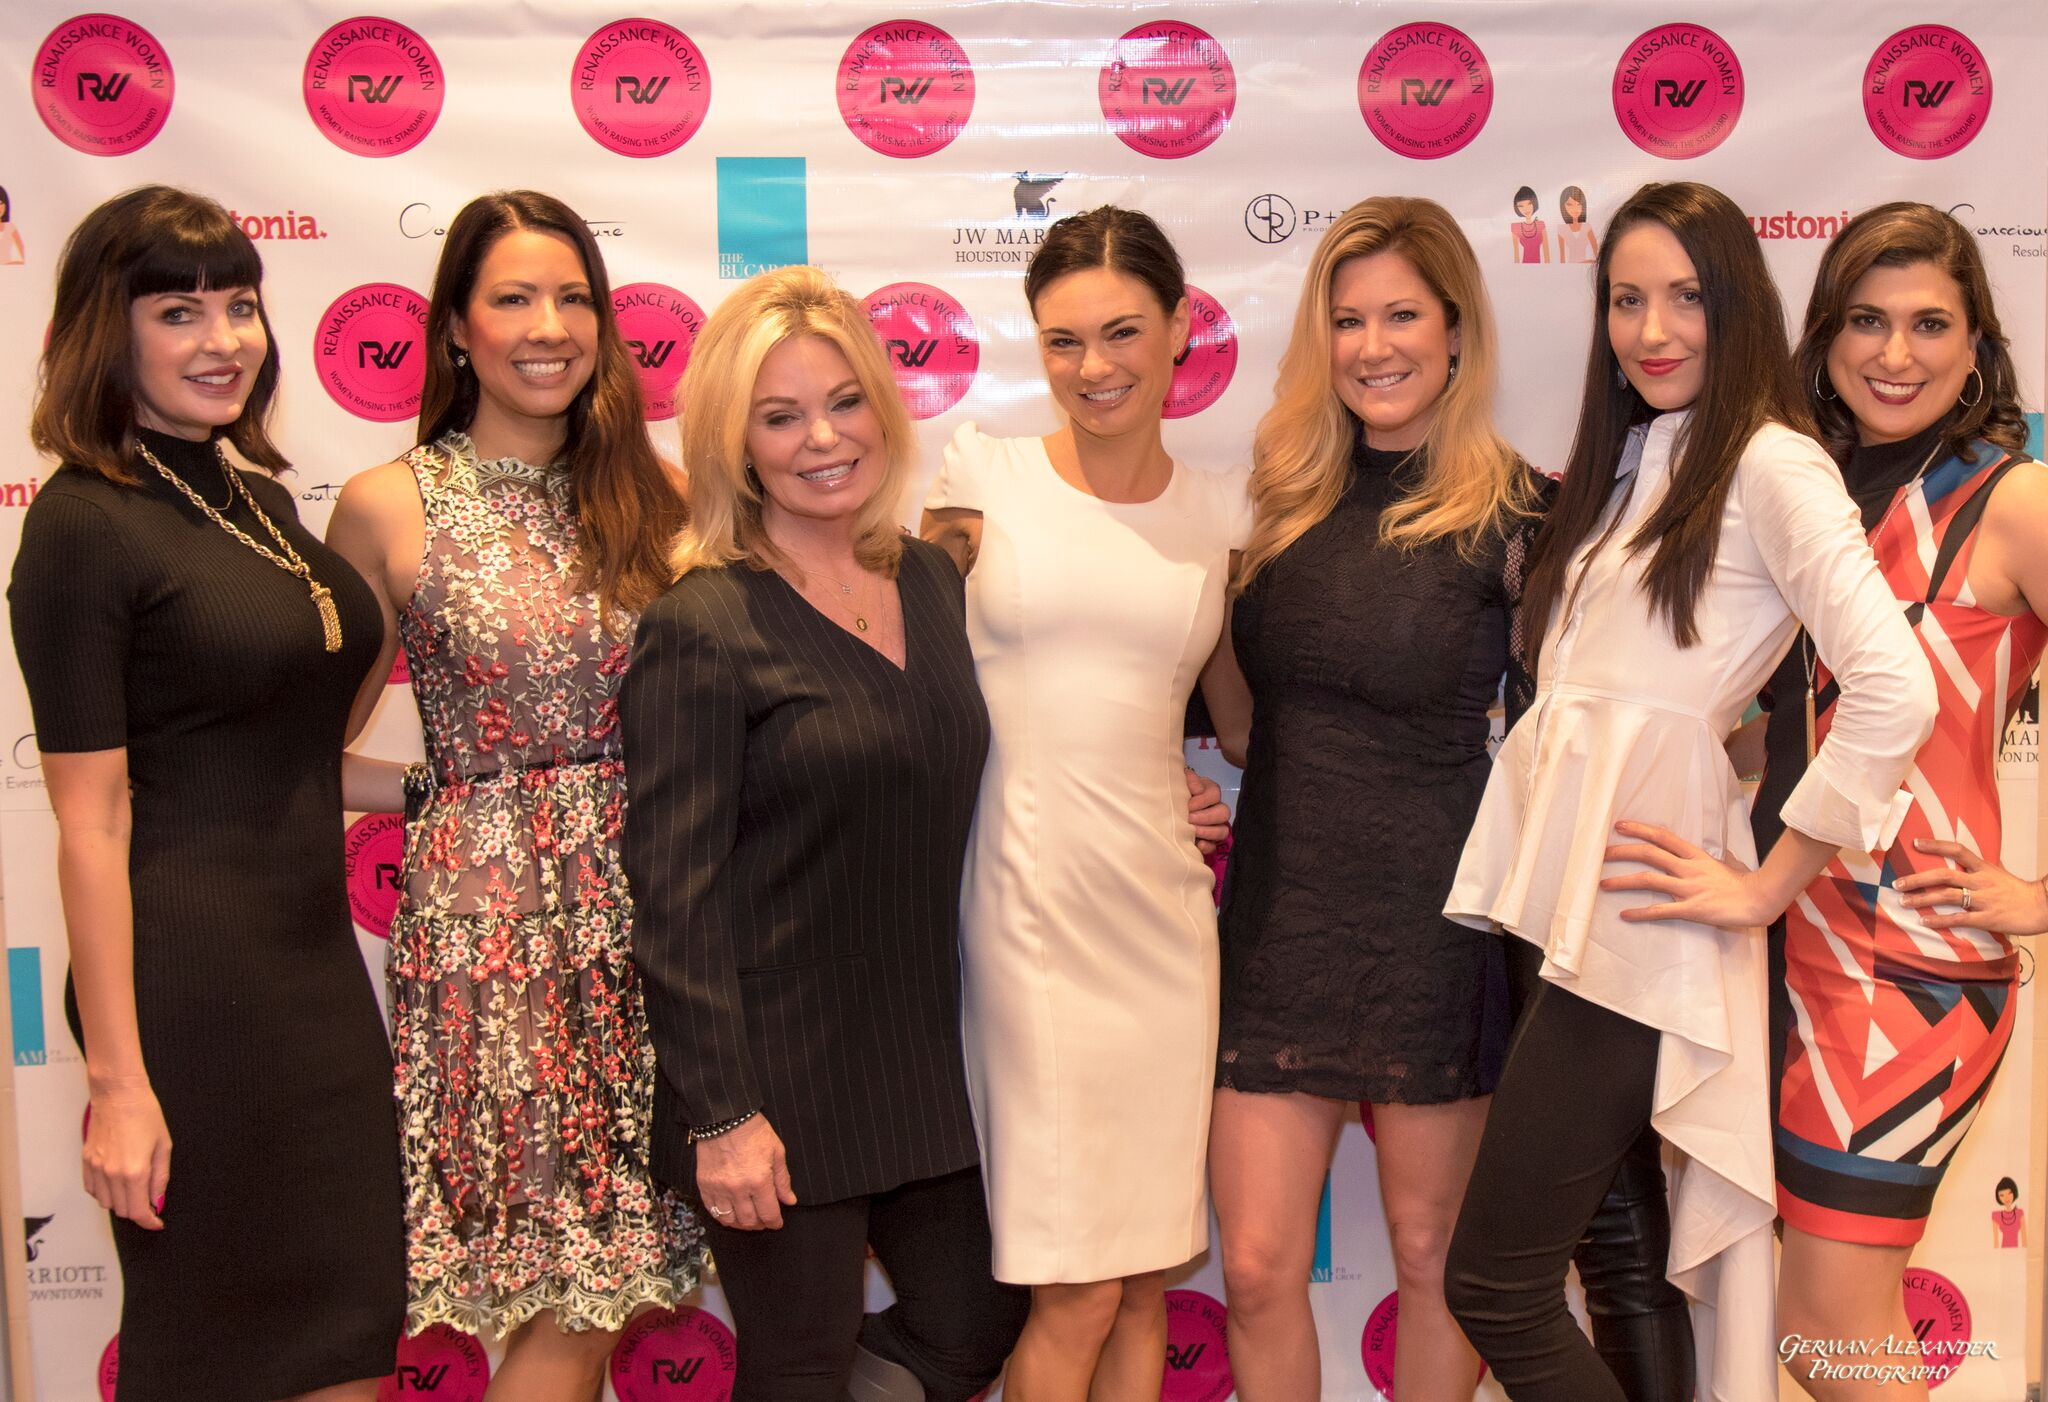 Staci Henderson, Anika Jackson, Tamilee Webb, Amanda Russell, Jen Groover, Shannah Quinn, Bianca Buc